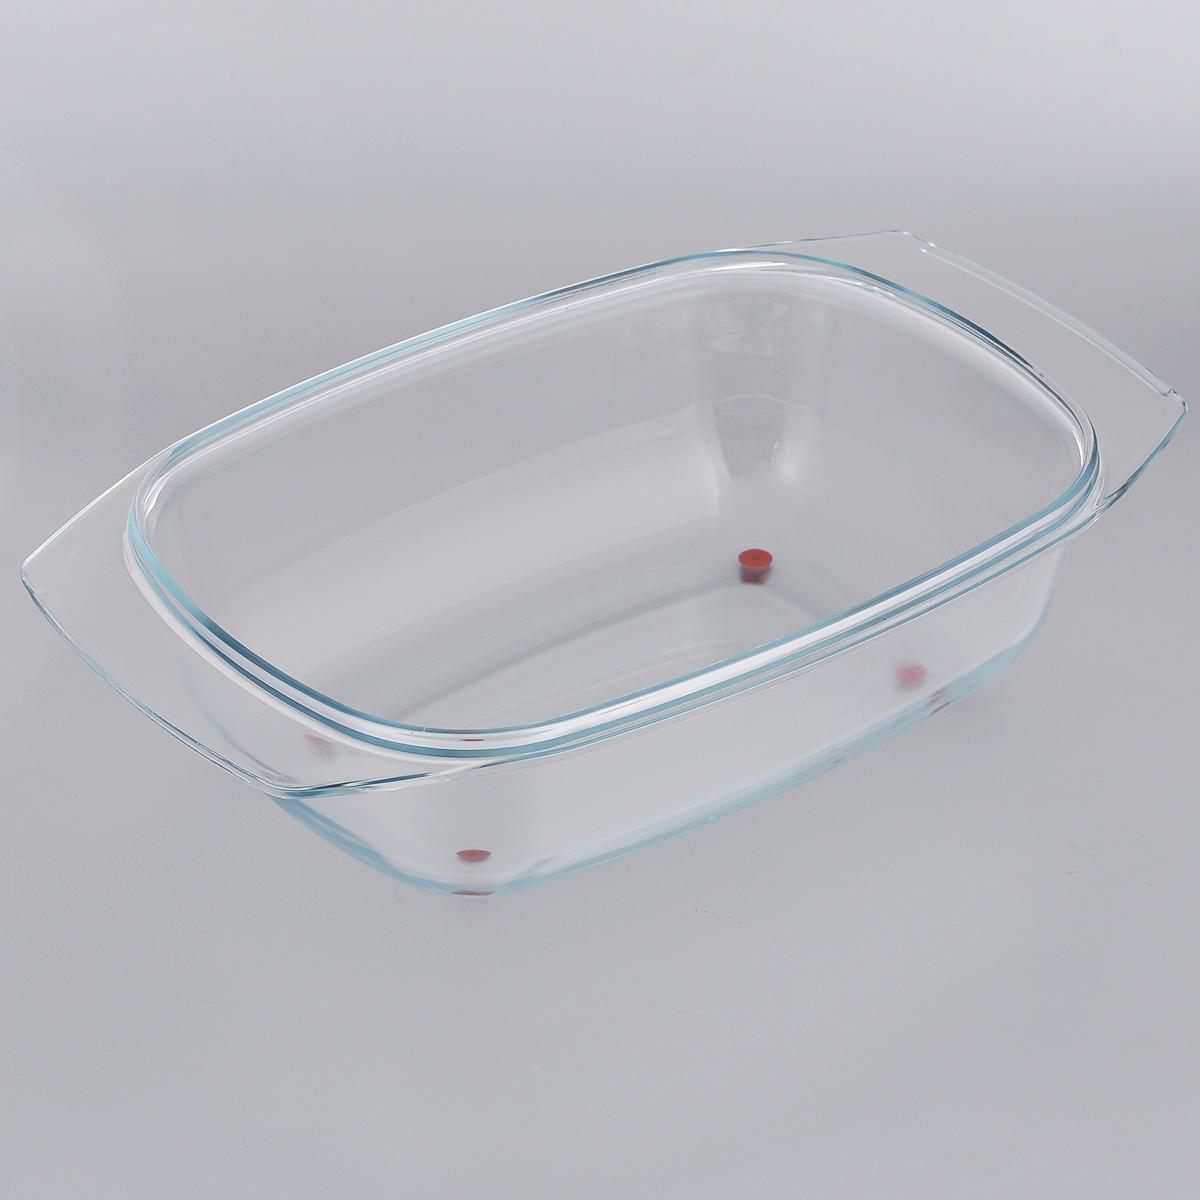 Жаровня Tescoma Delicia Glass, 42 х 26 см емкость мерная tescoma delicia 0 5 л